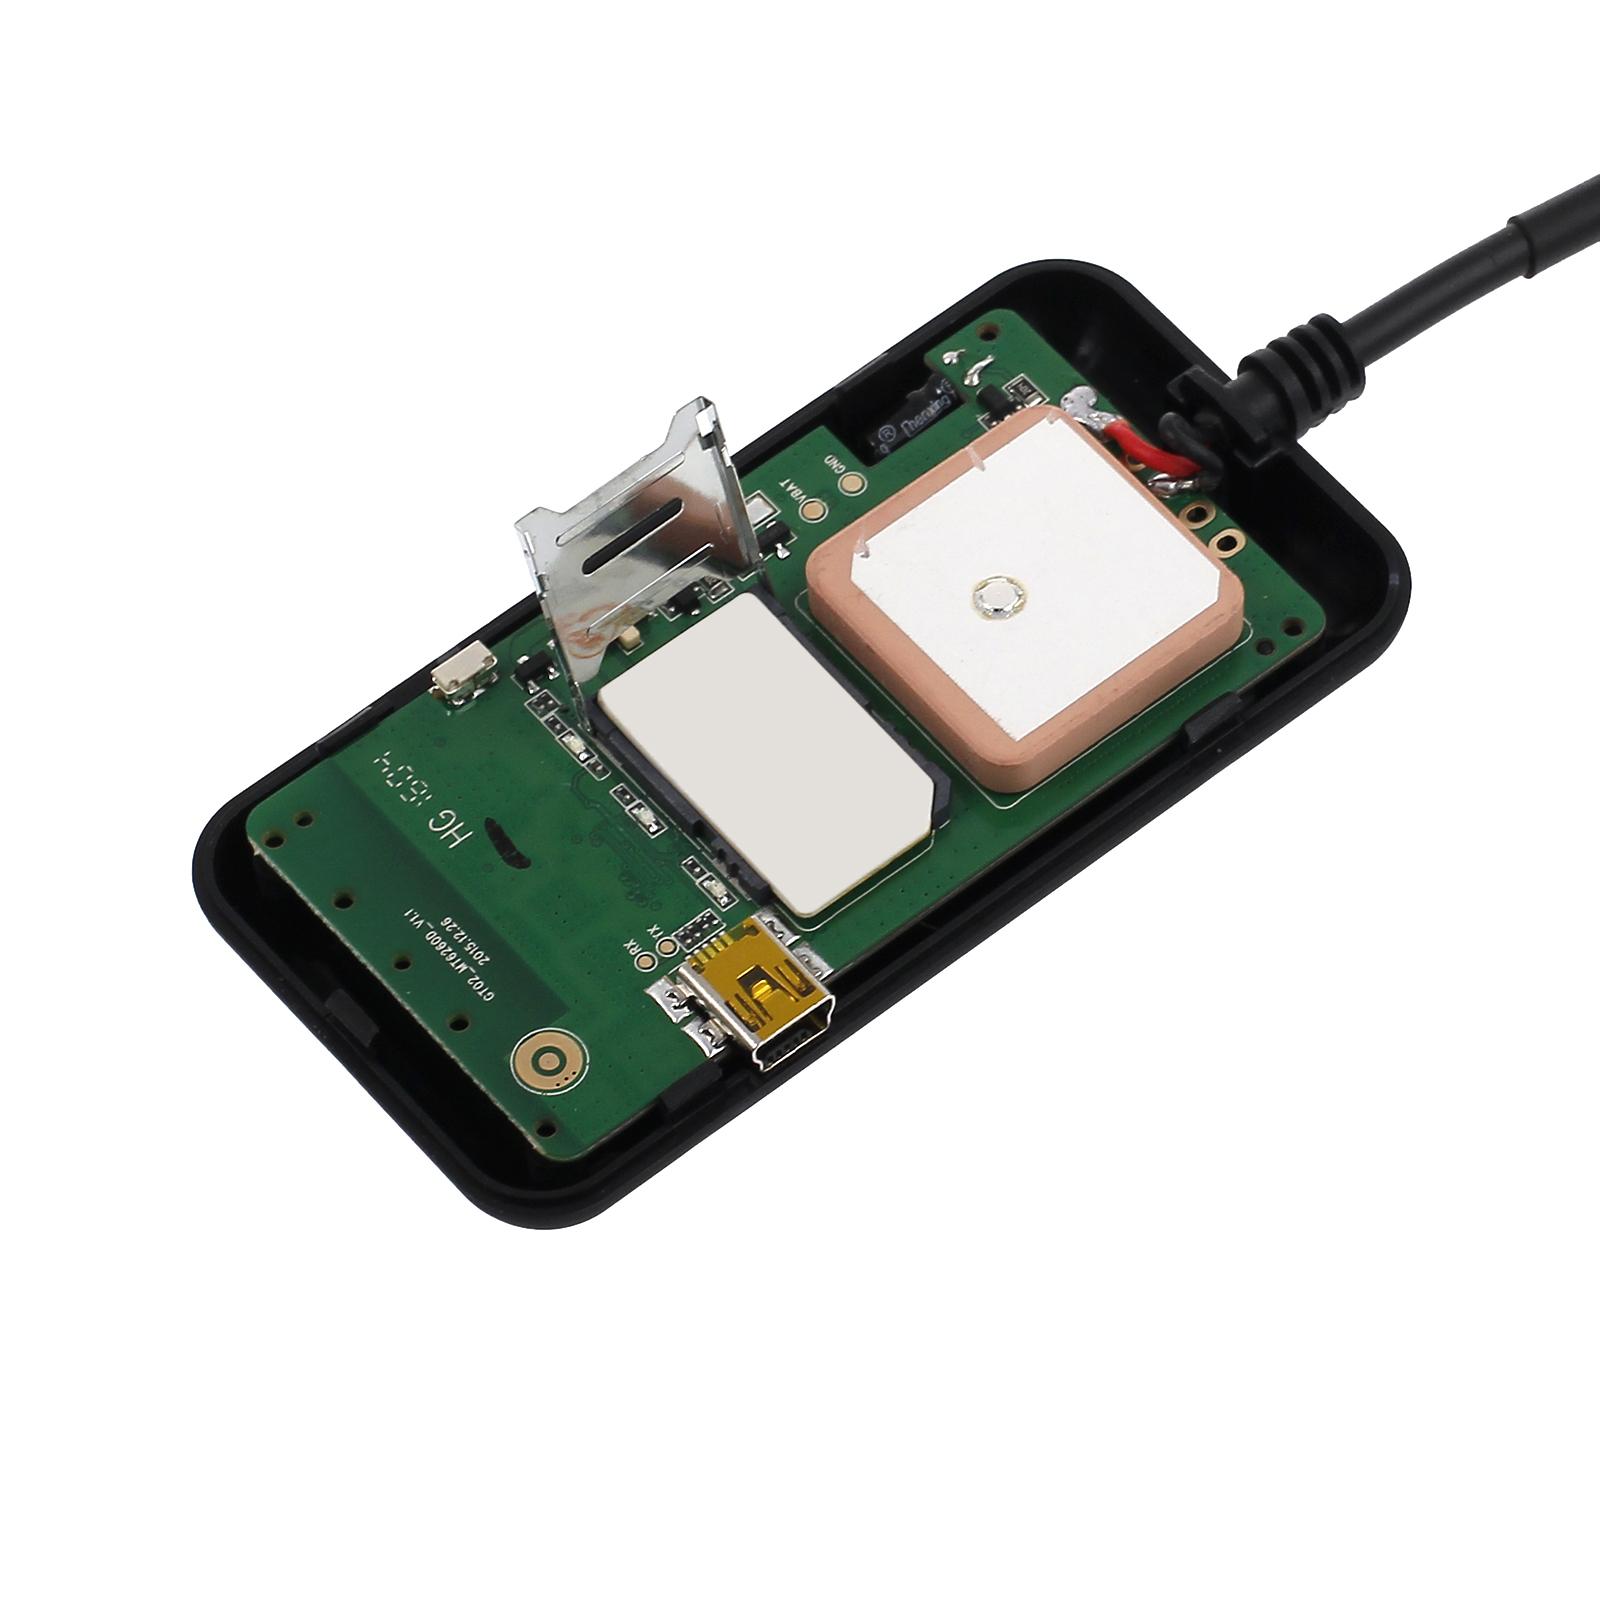 mini gps tracker peilsender tracking system gsm gprs auto. Black Bedroom Furniture Sets. Home Design Ideas